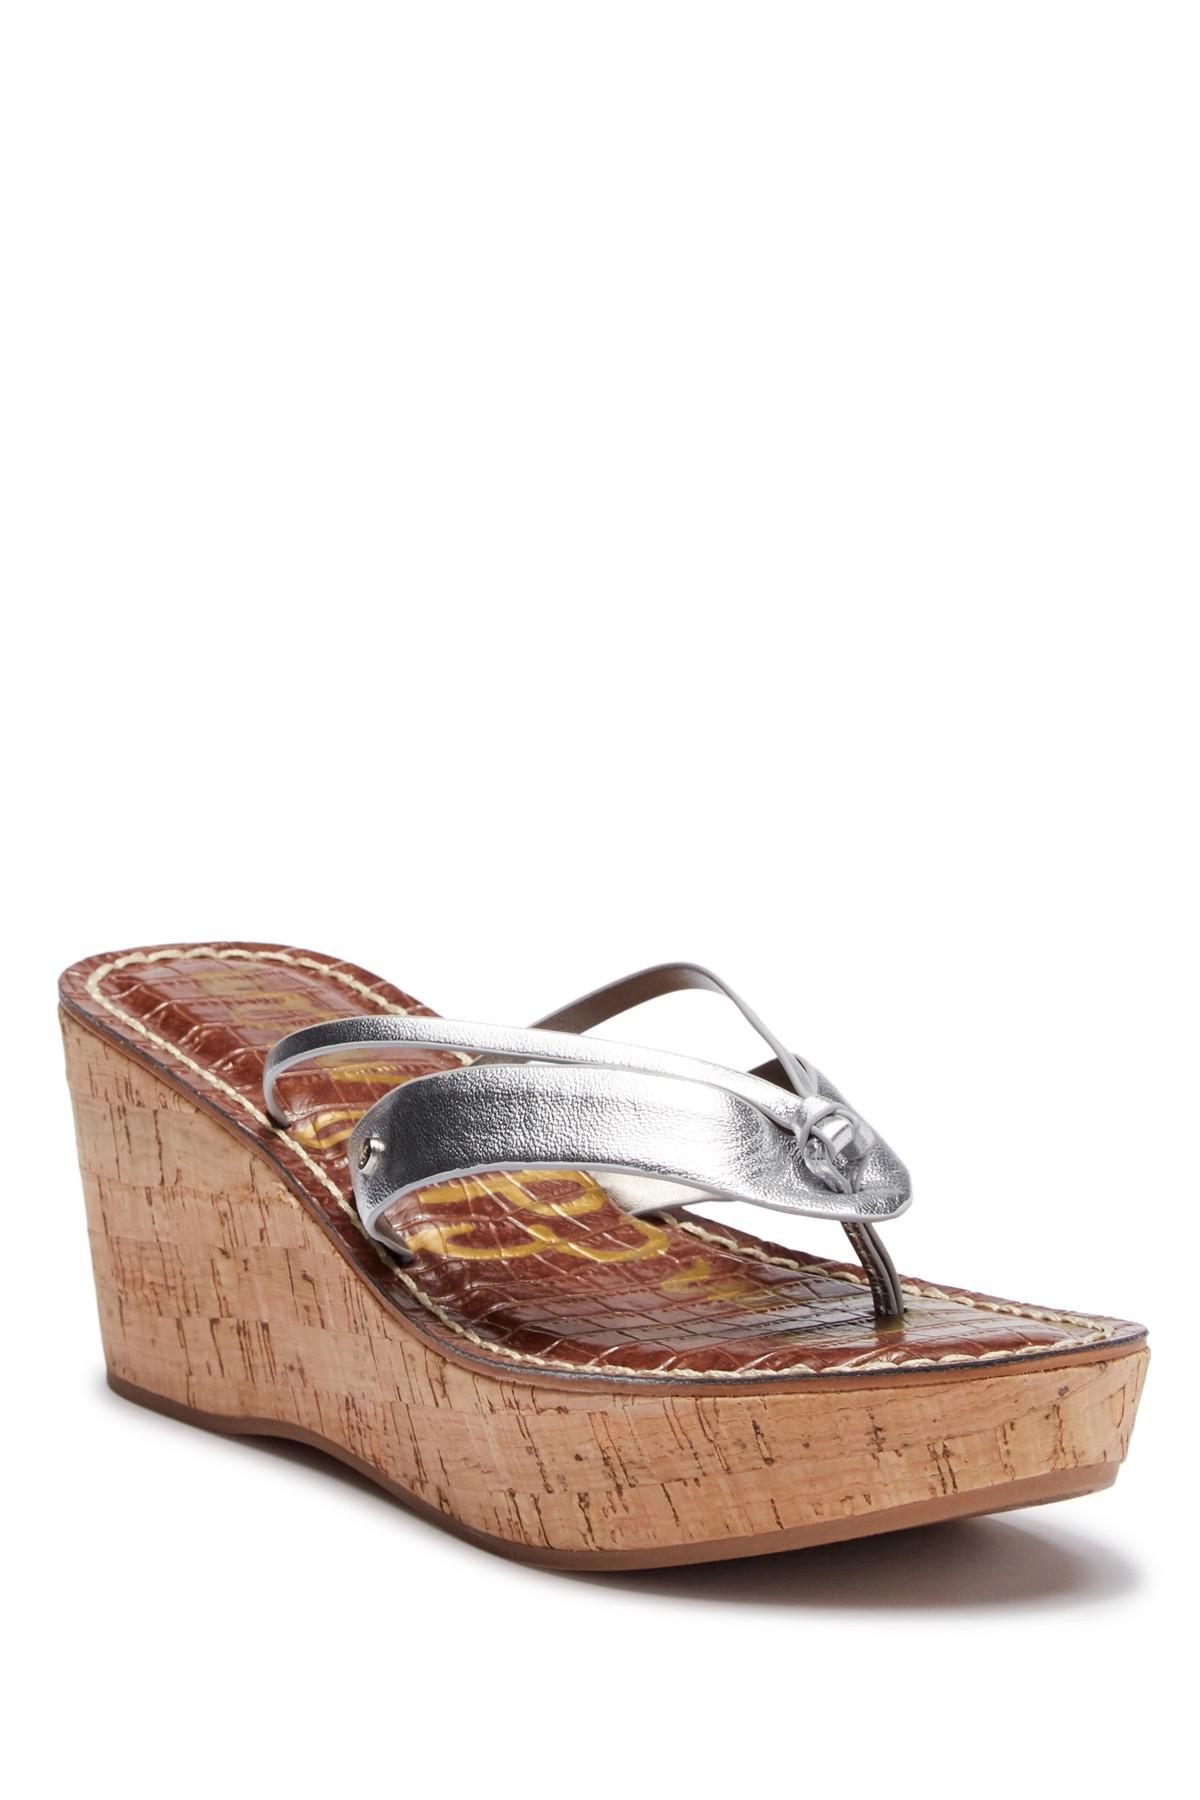 303f8776c9c28 Lyst - Sam Edelman Rona Platform Wedge Sandal in Metallic